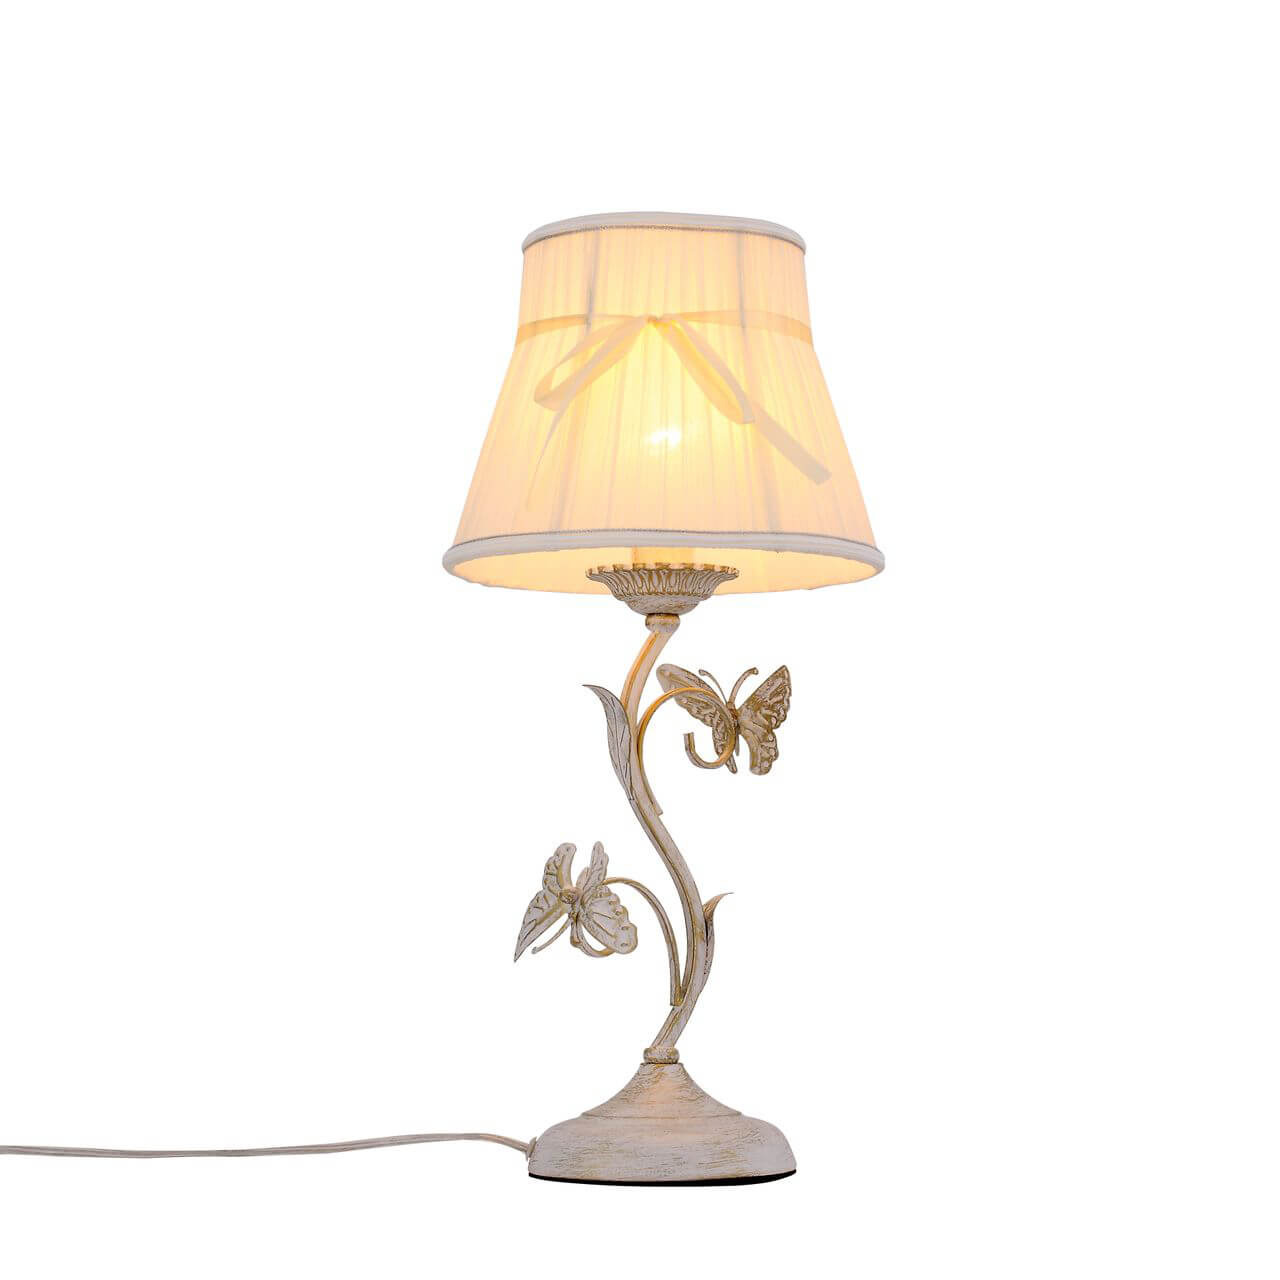 Настольная лампа ST Luce Farfalla SL183.524.01